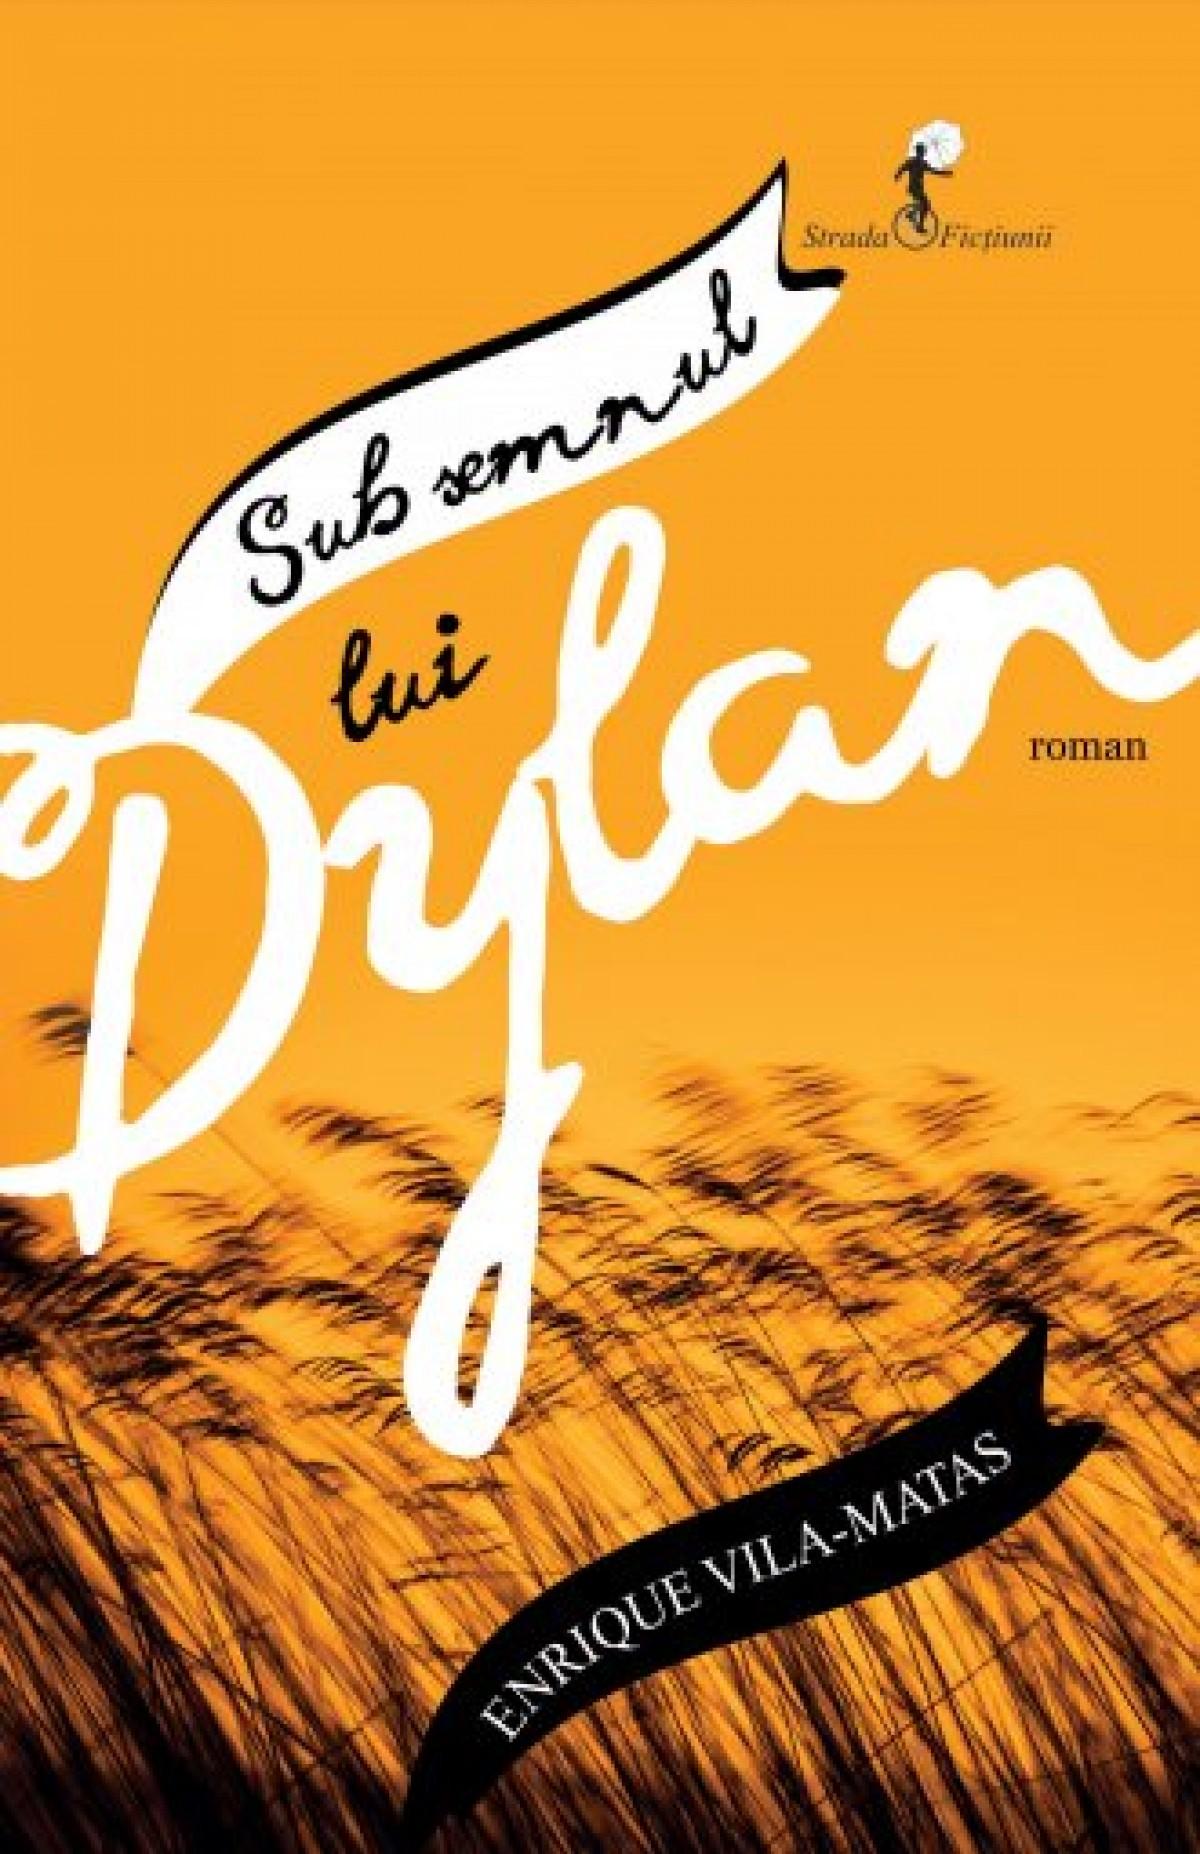 Sub semnul lui Dylan